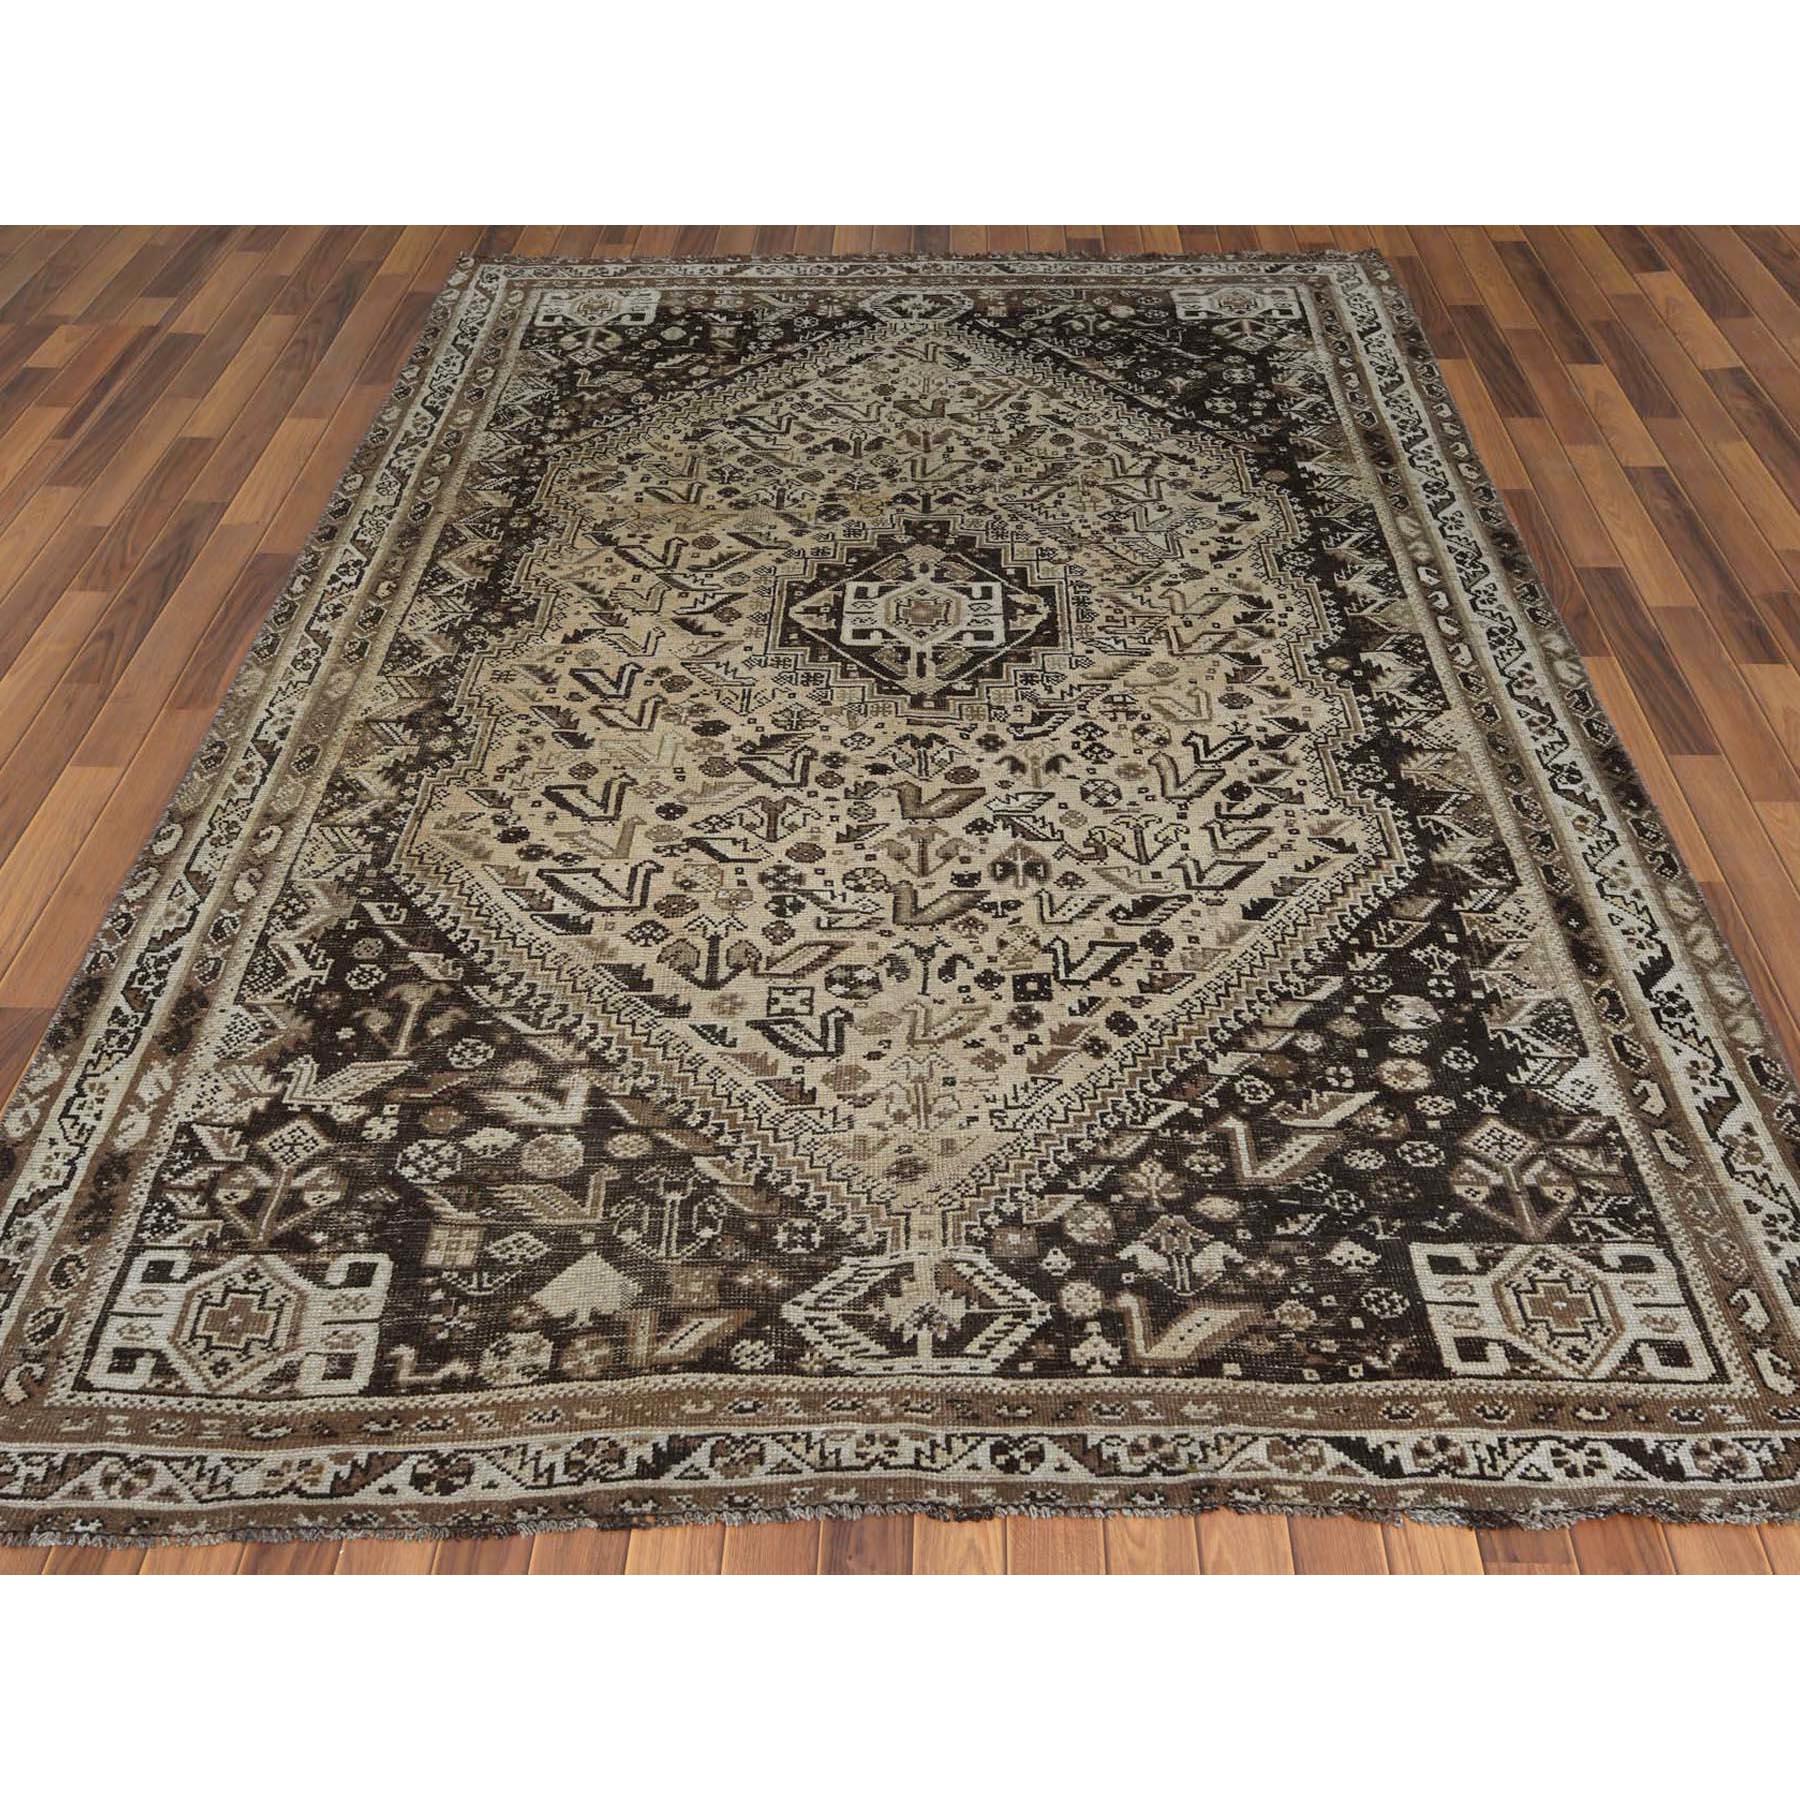 "7'1""x10' Semi Antique Taupe Hand Knotted Persian Shiraz Bohemian Worn Down Clean Natural Wool Clean Oriental Rug"